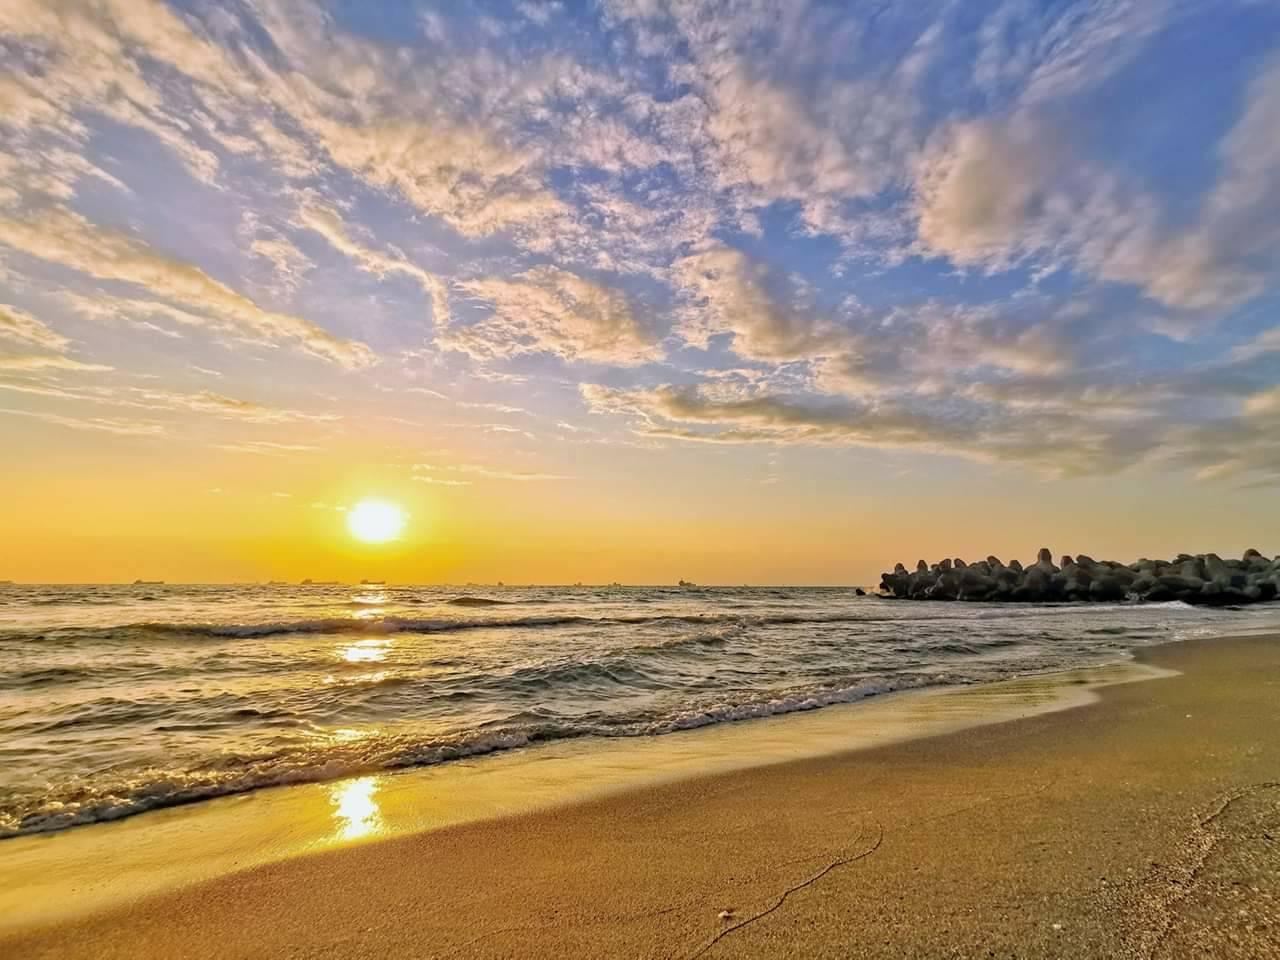 Cijin Sunset Beach 旗津夕陽